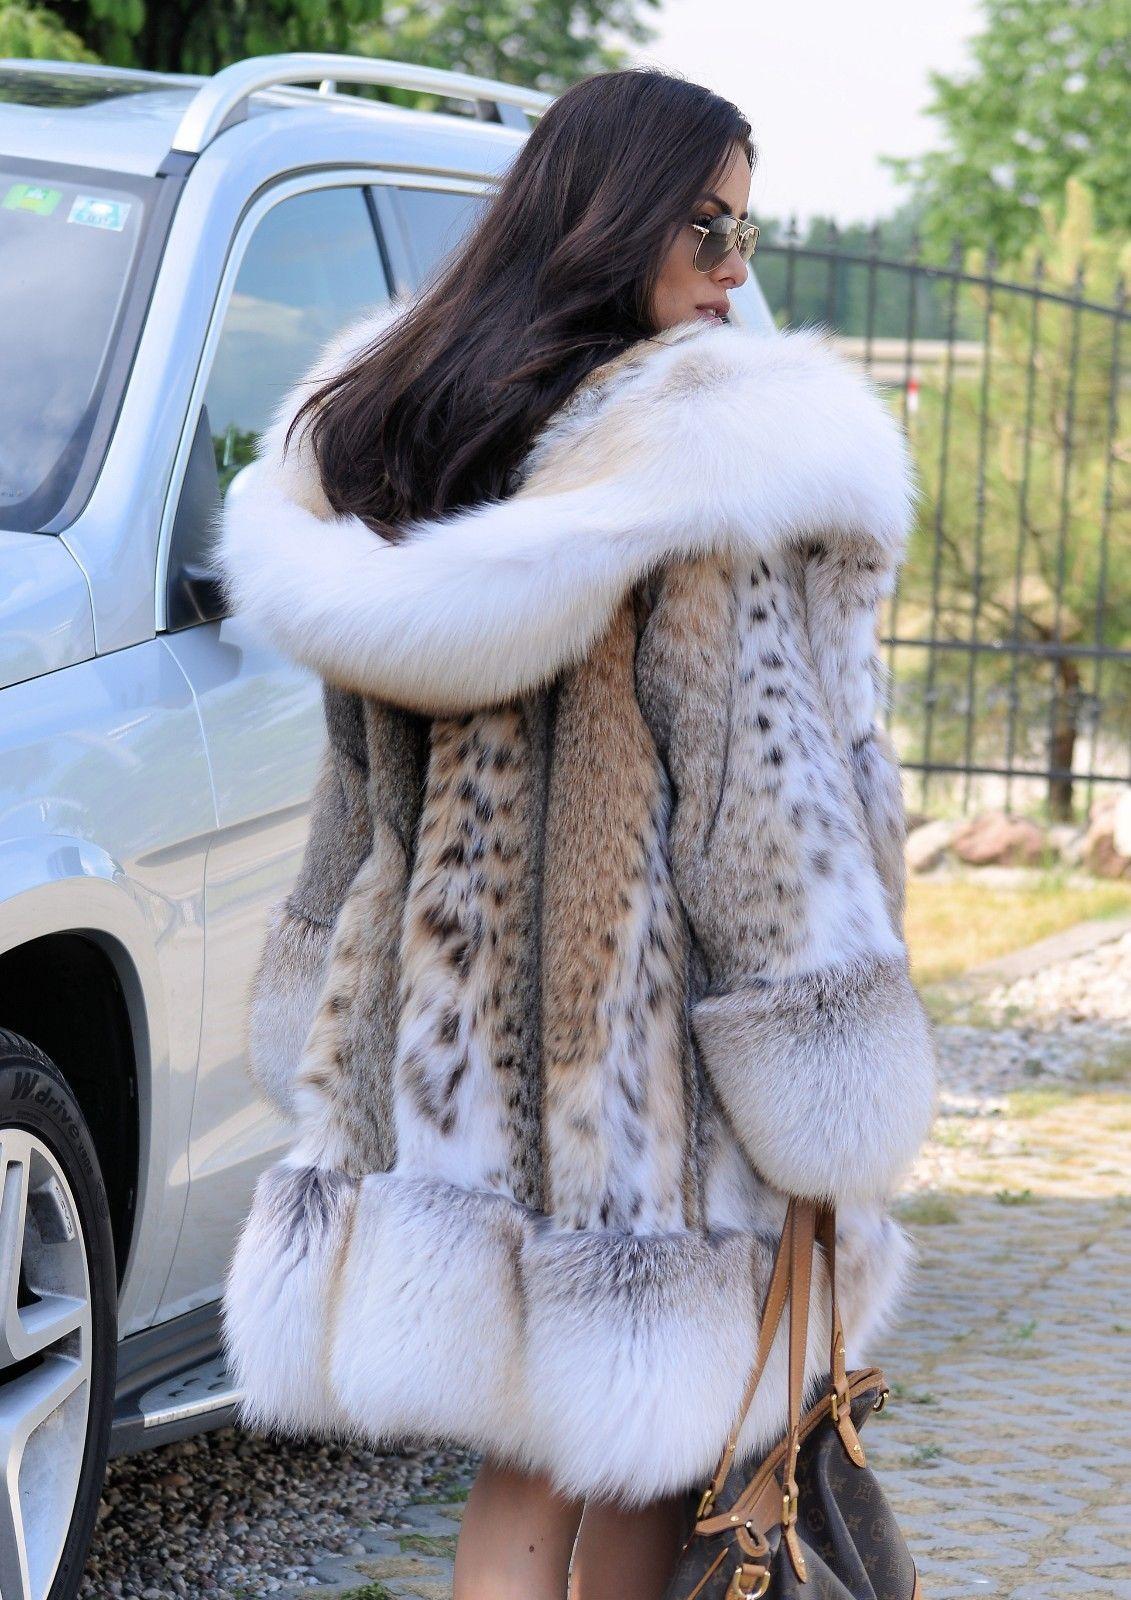 ef0dd113f8 NEW 2018 LYNX FUR COAT HOOD FOX CLASS- RUSSIAN SABLE JACKET MINK CHINCHILLA  LONG | eBay